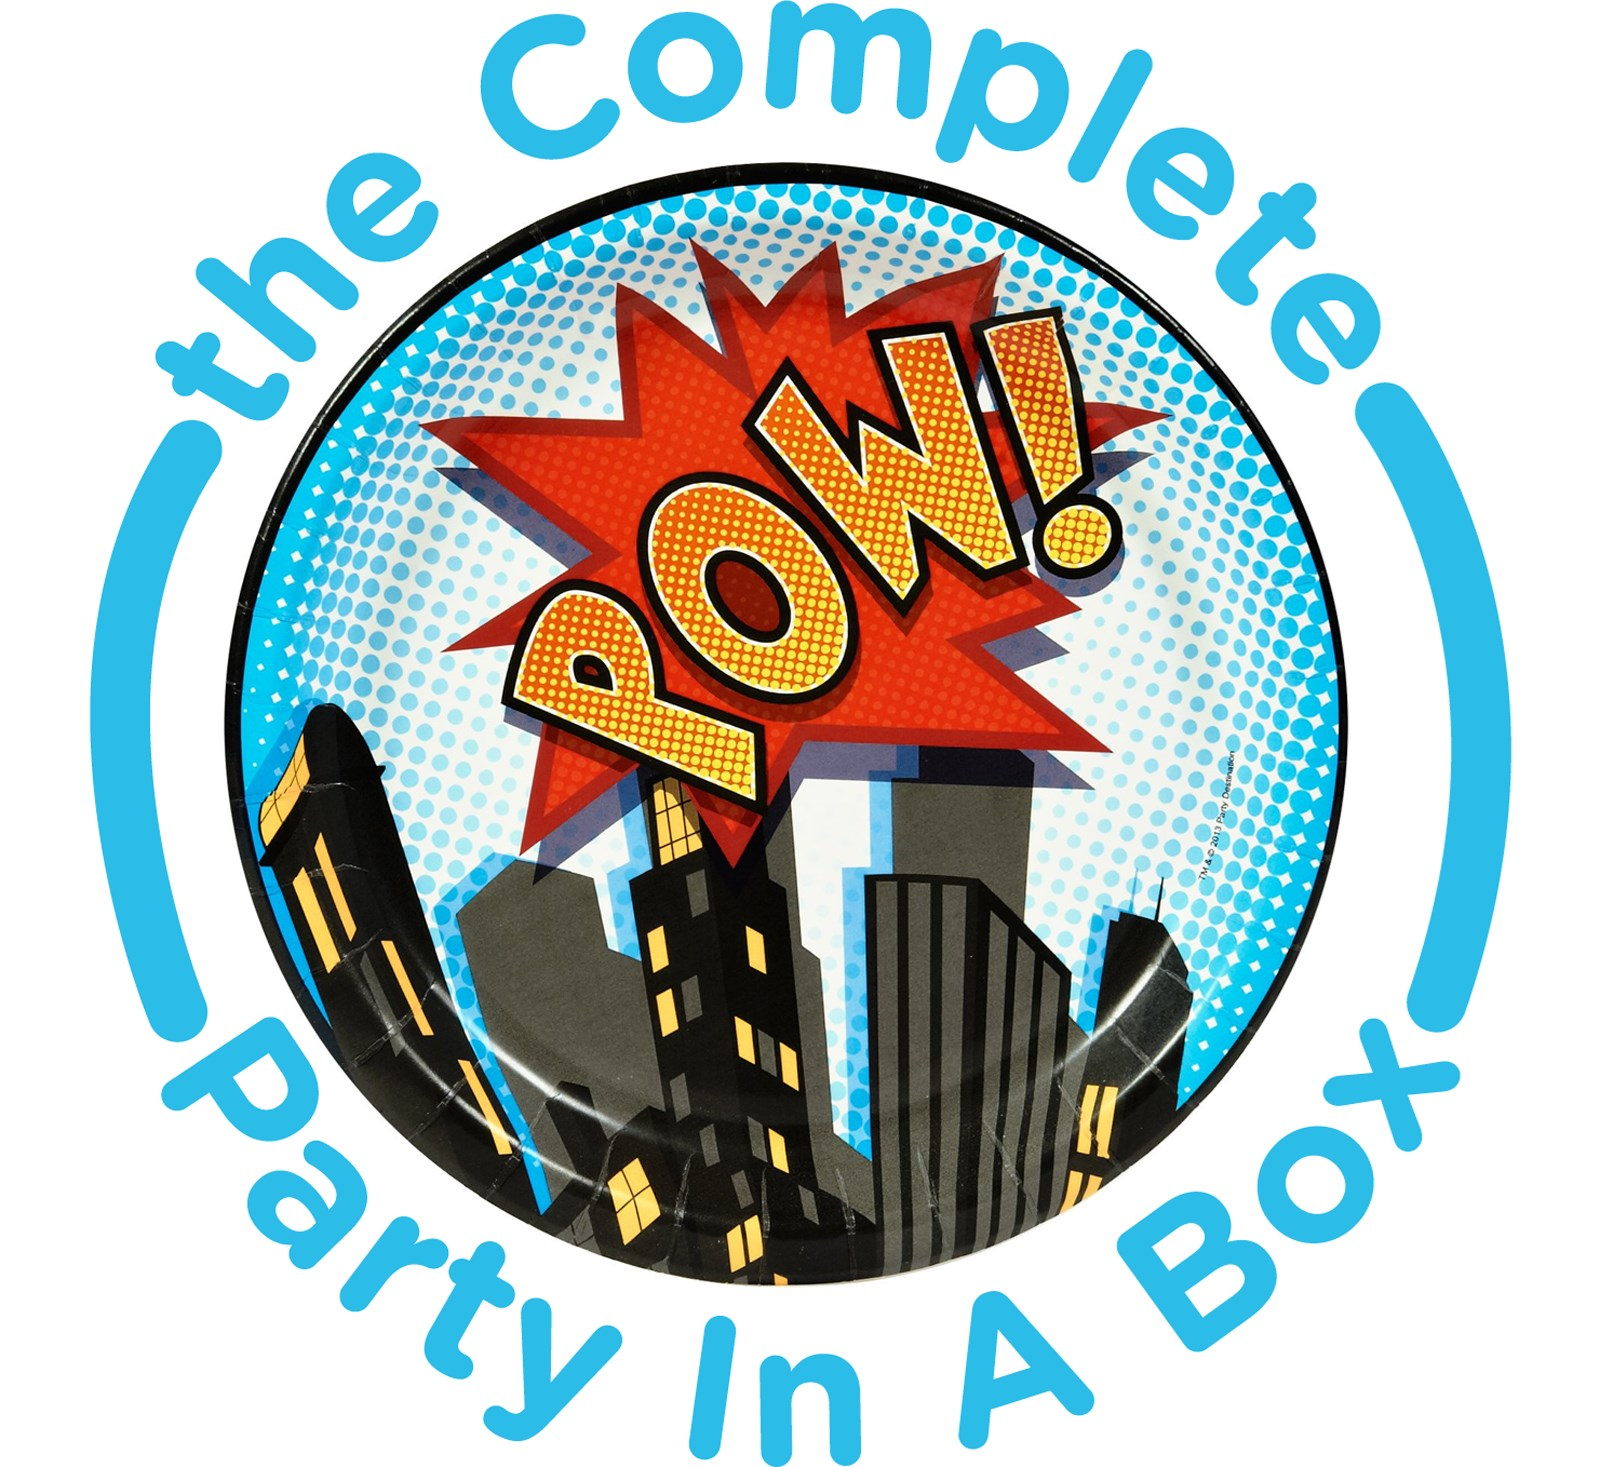 Superhero Party Supplies in a Box